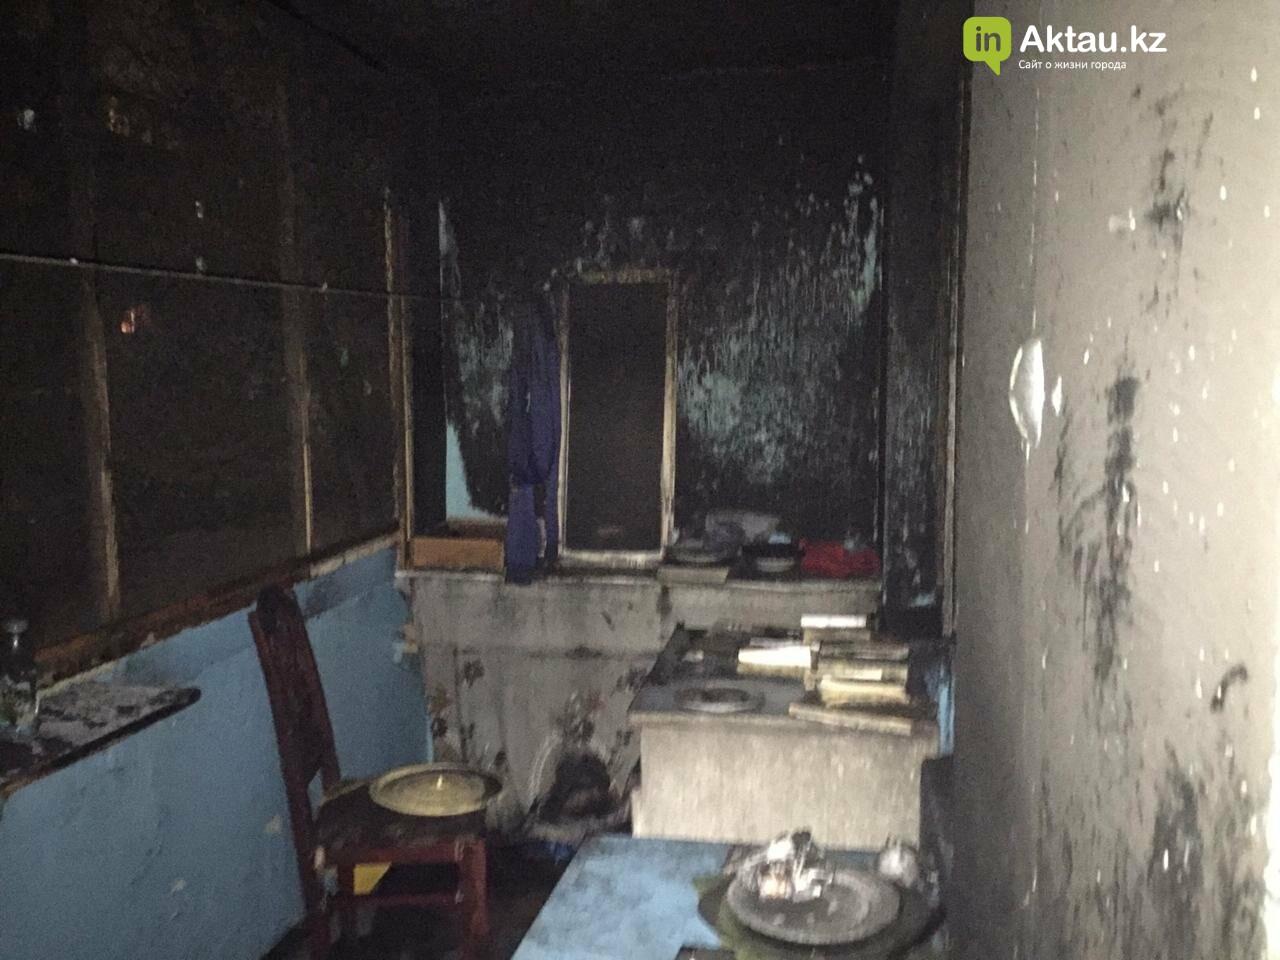 В Актау из-за пожара в квартире пострадал пенсионер, фото-1